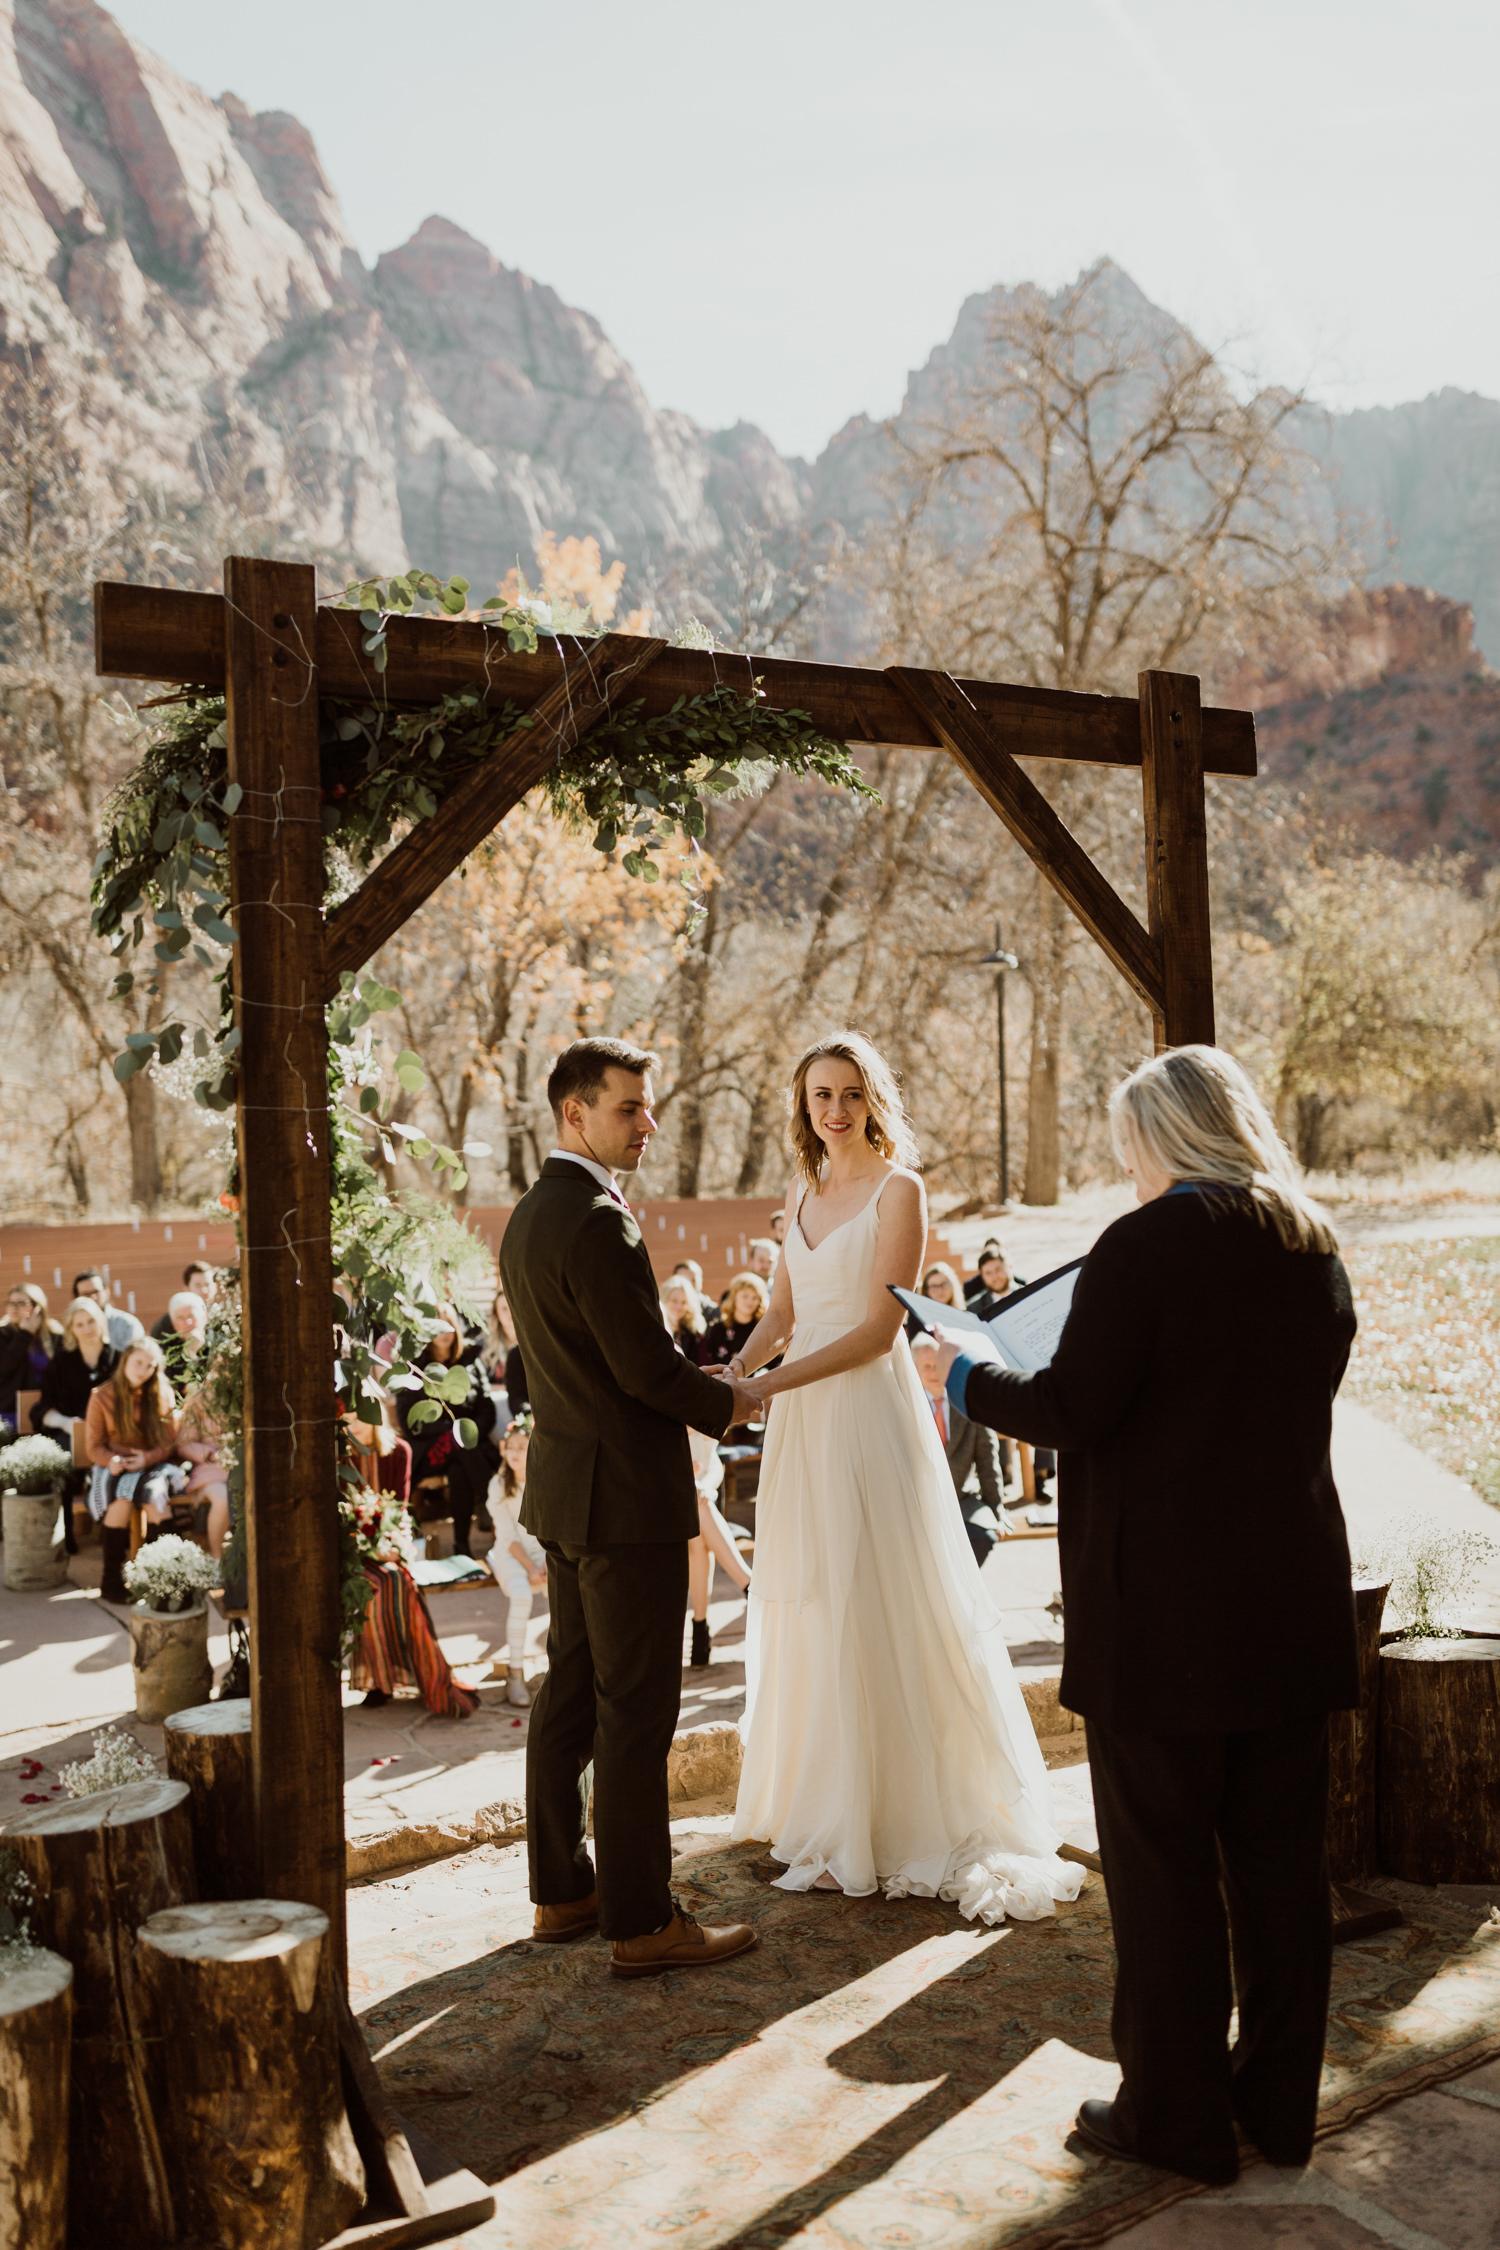 zion-national-park-wedding-79.jpg